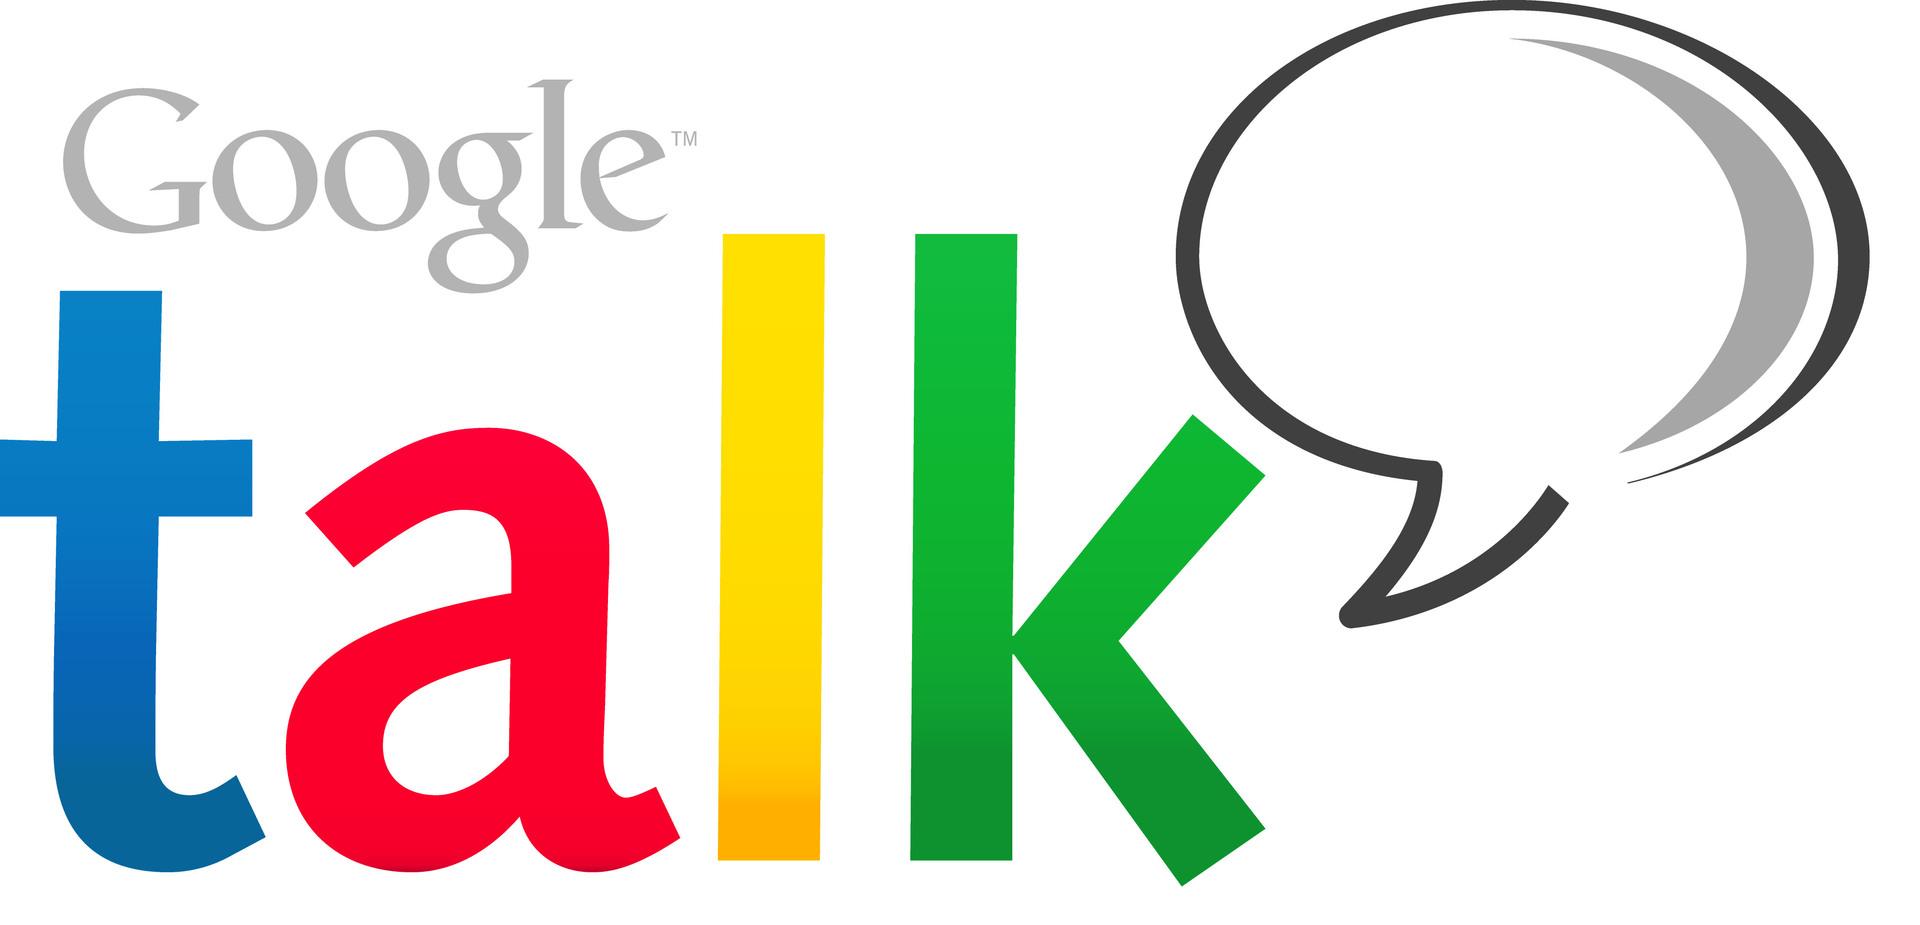 Google talk服务将停止